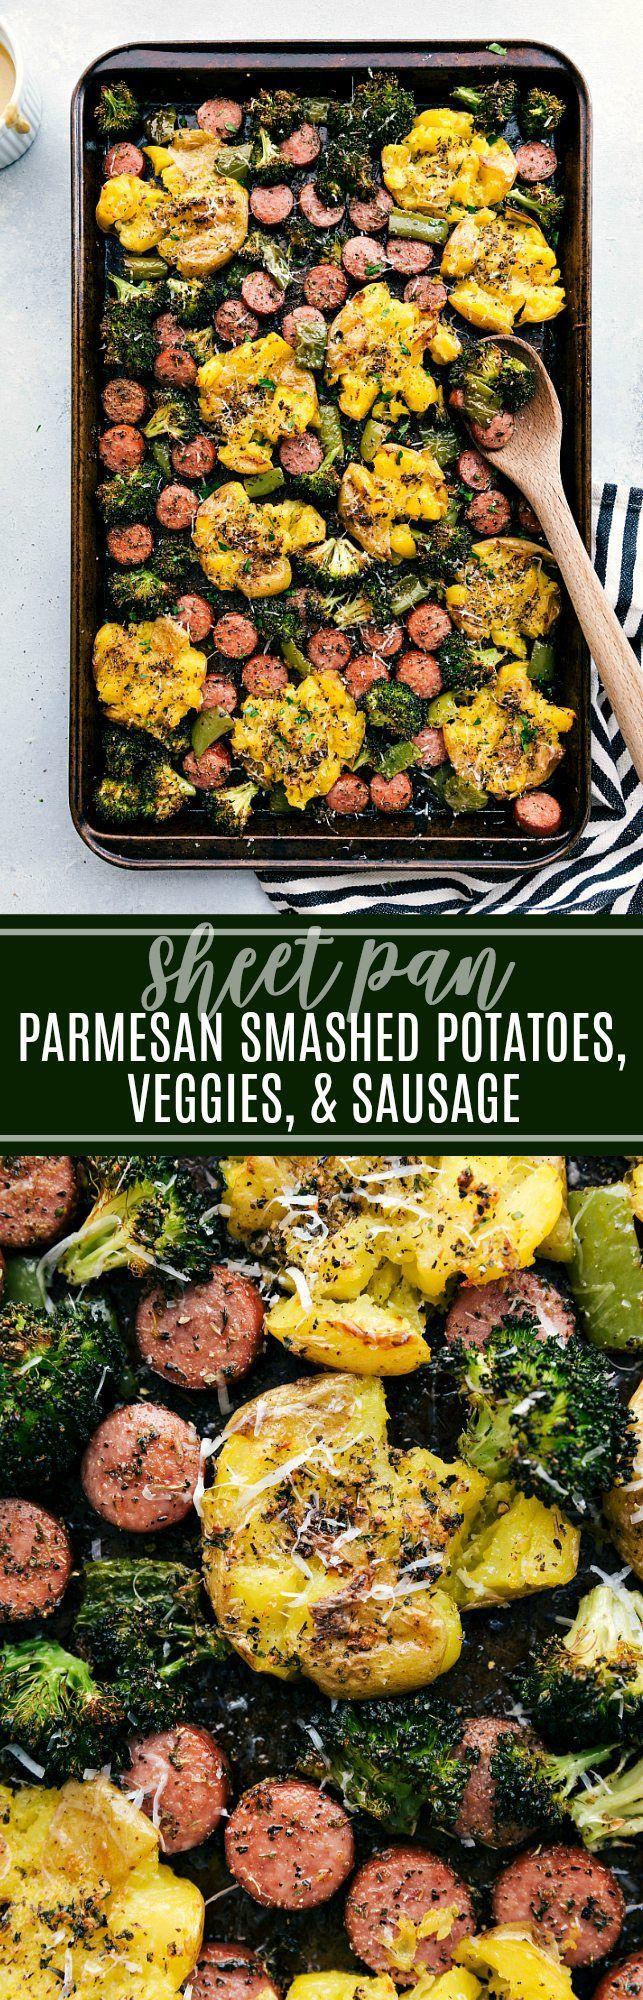 SHEET PAN Italian Sausage, Roasted Veggies, and Crispy Garlic Parmesan Smashed Potatoes! chelseasmessyapron.com #crispy #smashed #garlic #potatoes #veggies #sausage #easy #italian #quick #dinner #kidfriendly #parmesan #fast #prep #broccoli #pepper #herbs